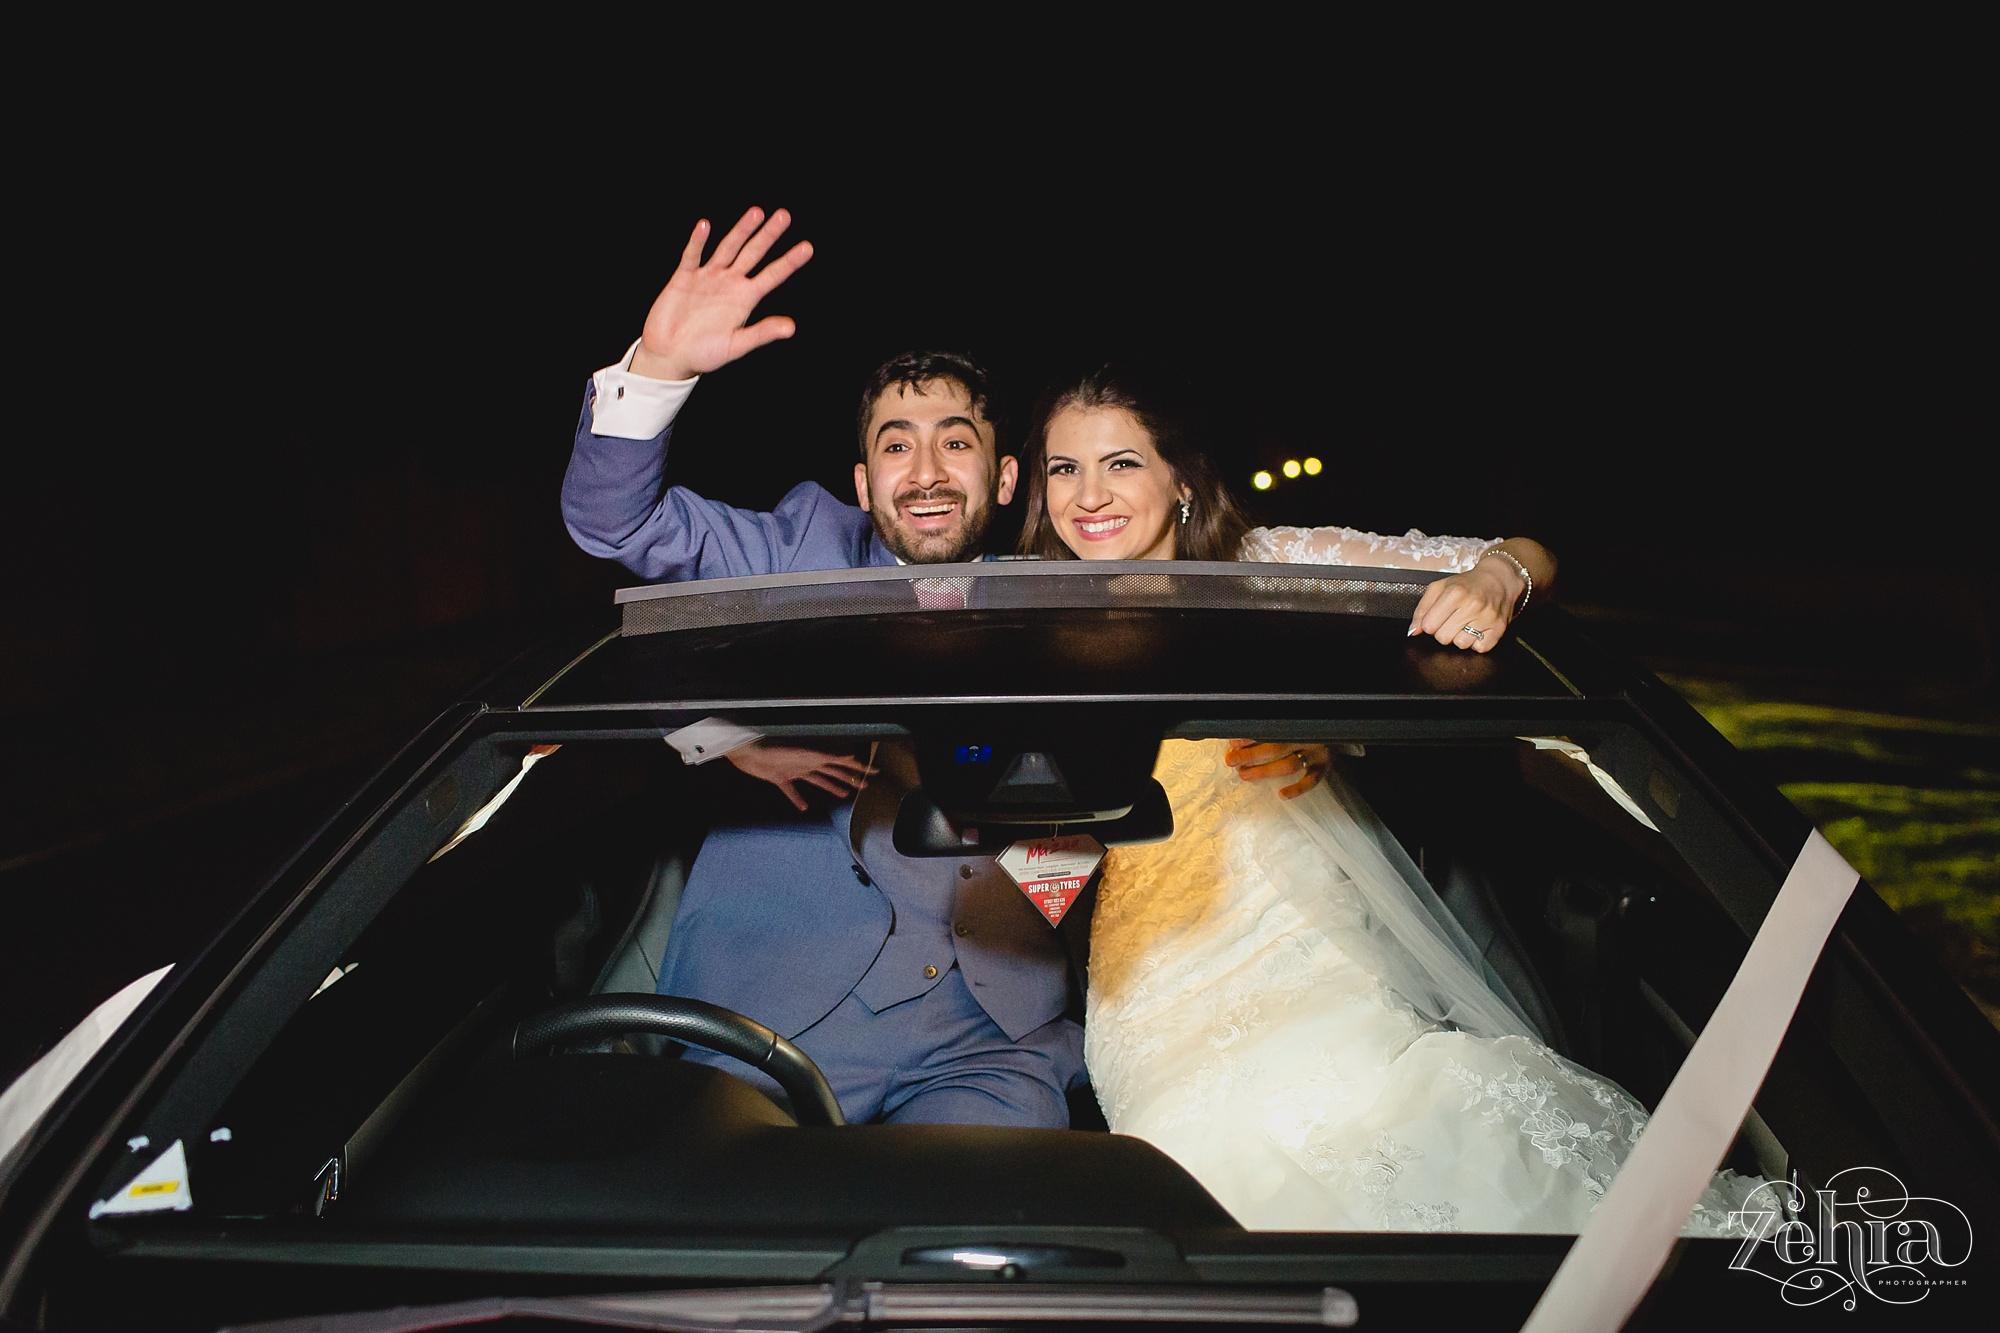 zehra photographer mere cheshire wedding_0069.jpg